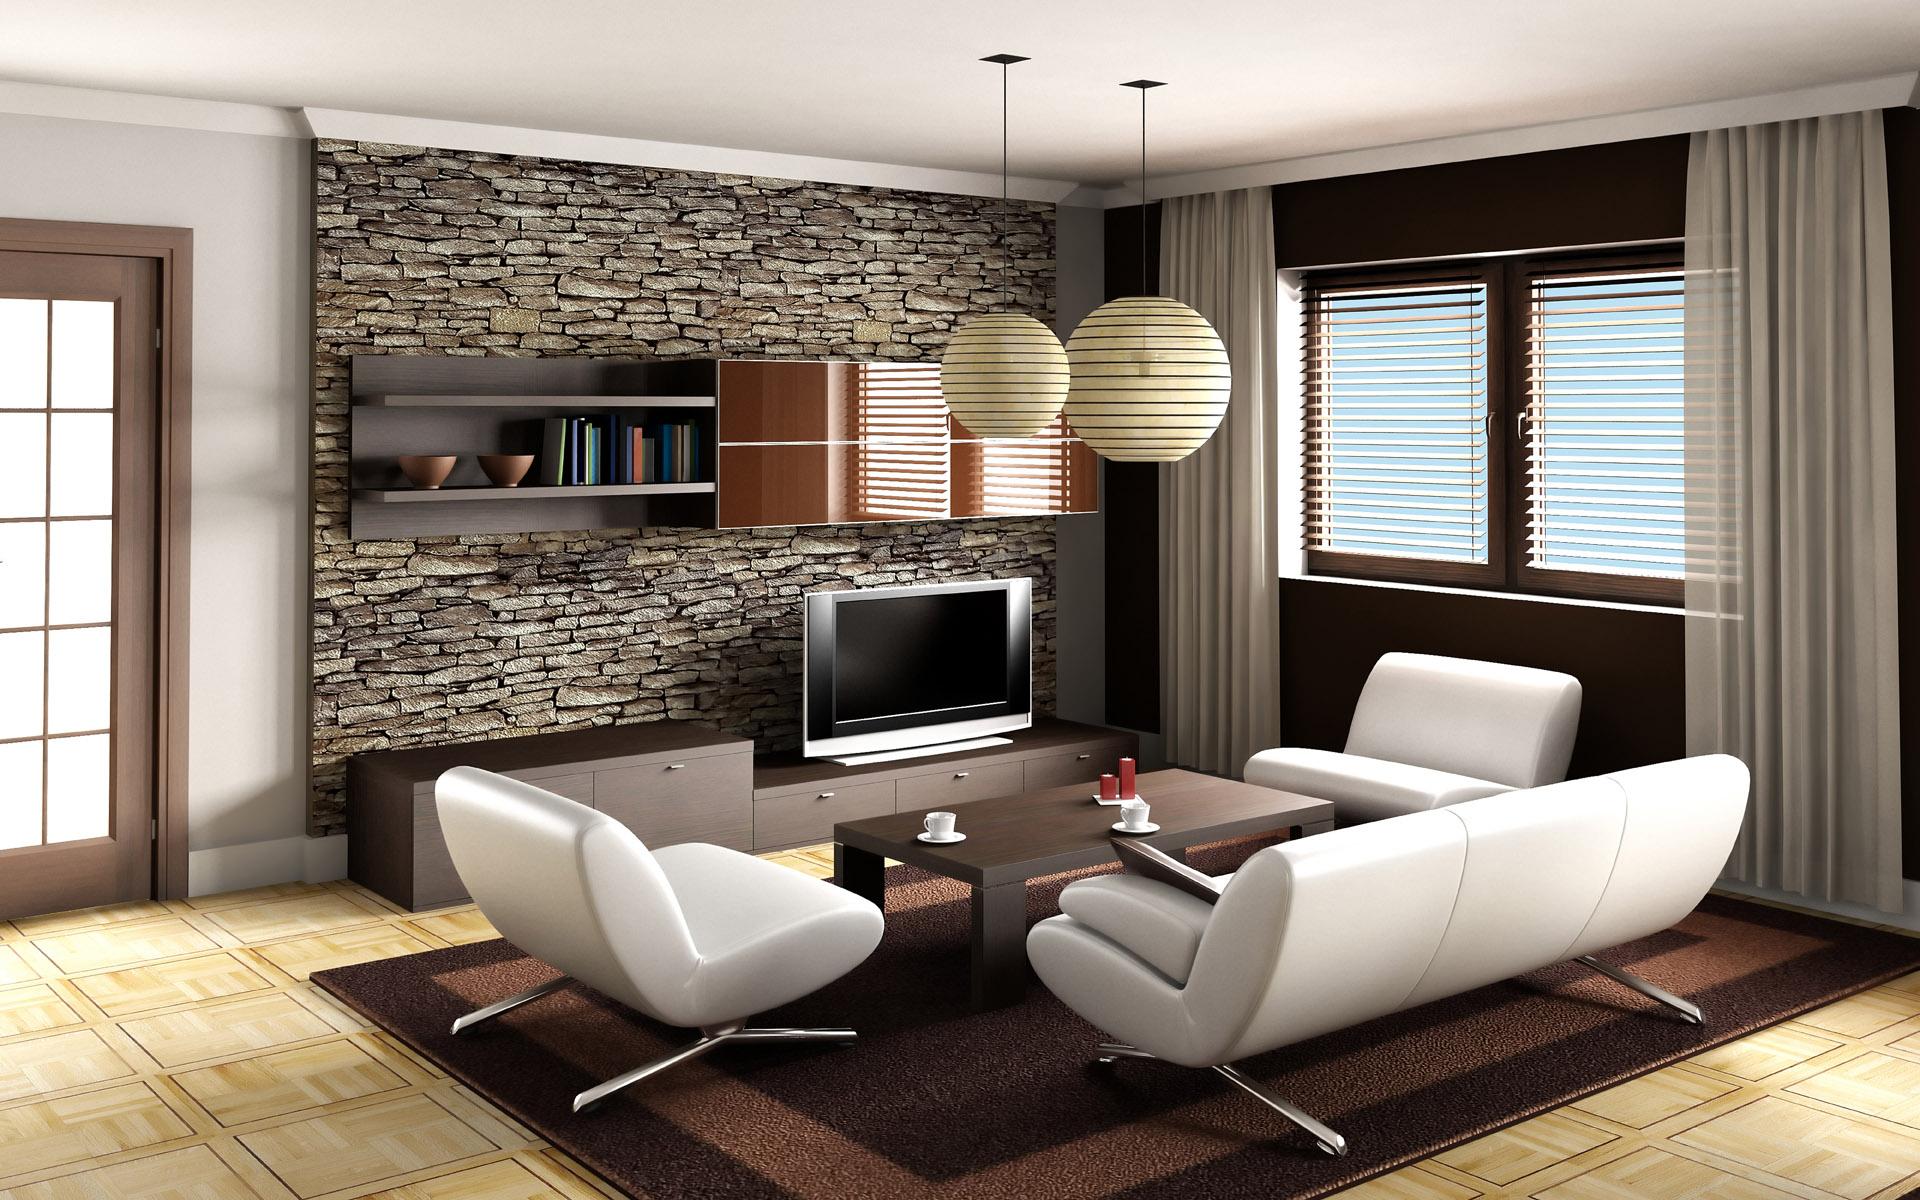 tasty-living-room-design-ideas-brown-sofa